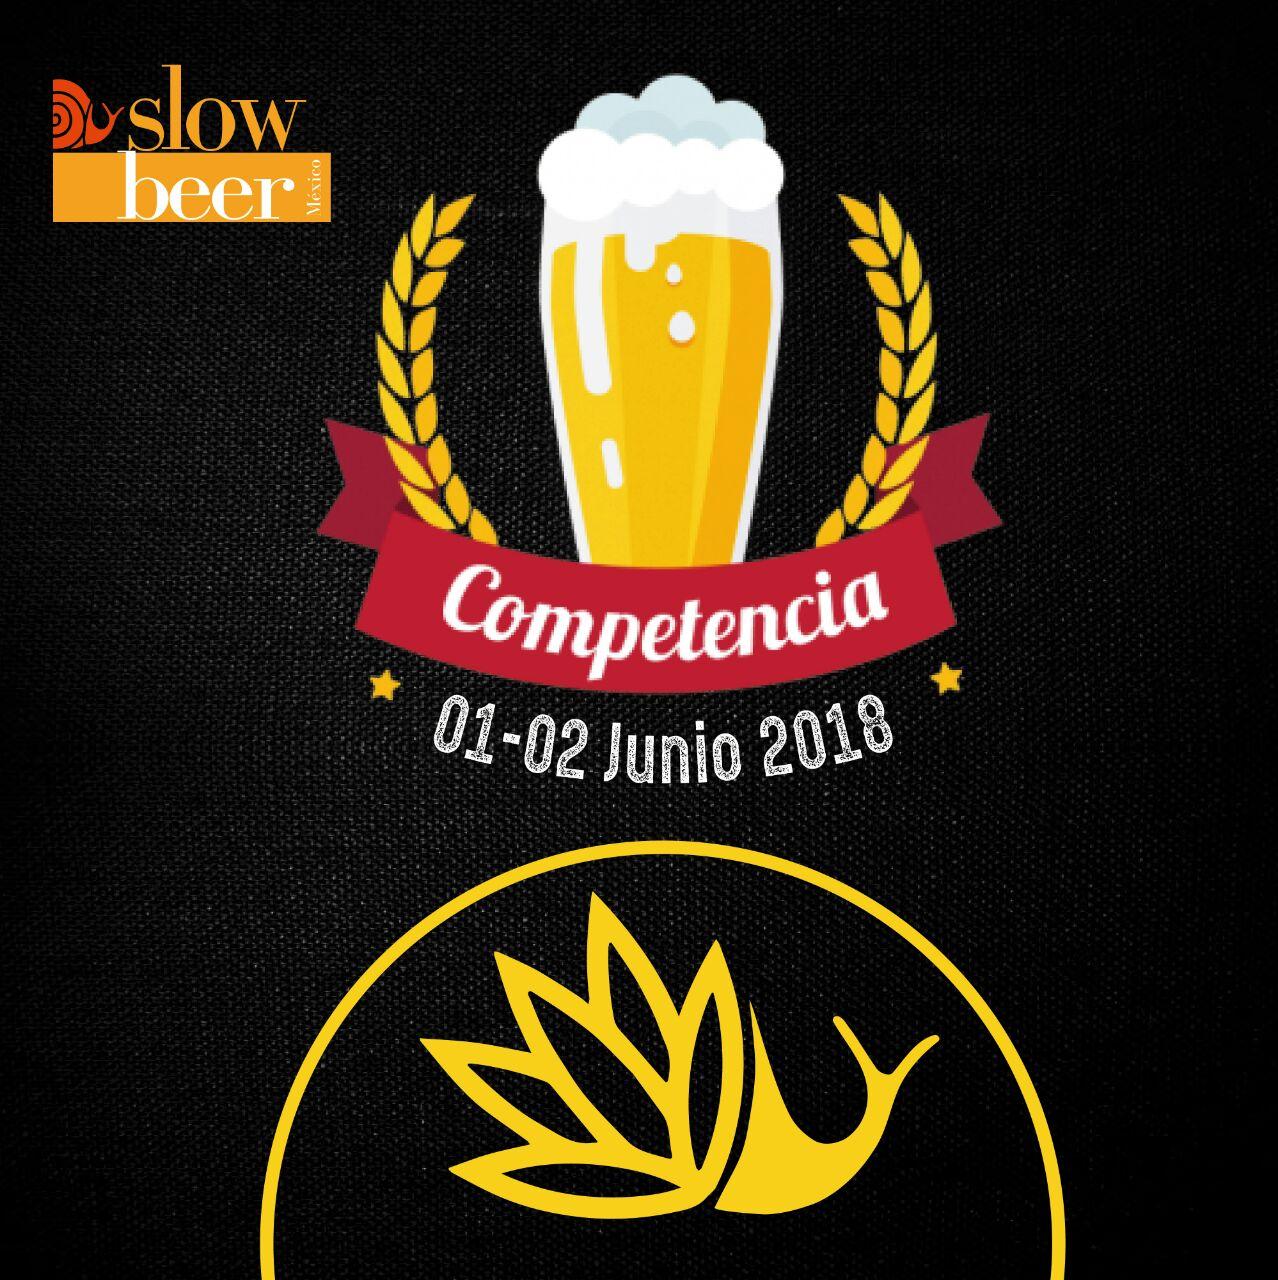 Competencia Slow Beer México 2018